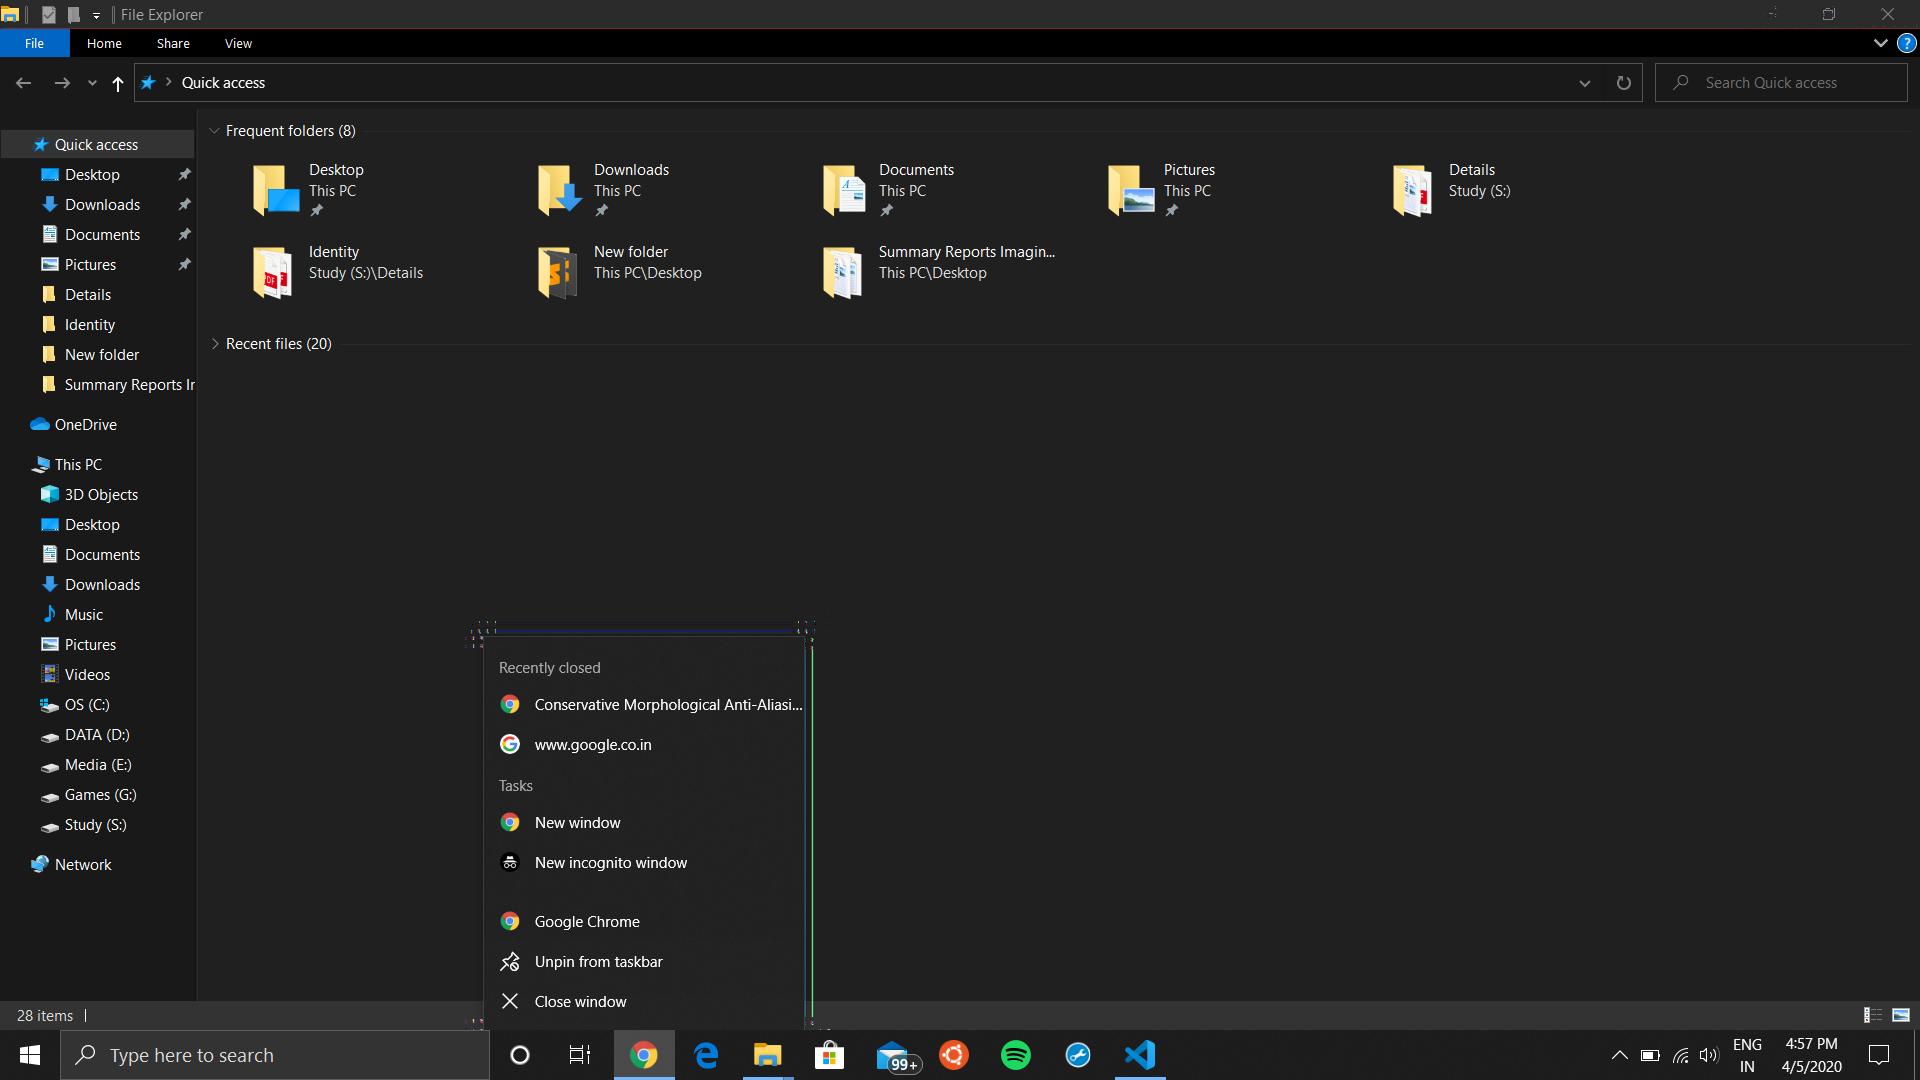 Windows 10 UI glitch f44d24d7-a7bb-459a-a6a7-581d4e03396c?upload=true.png